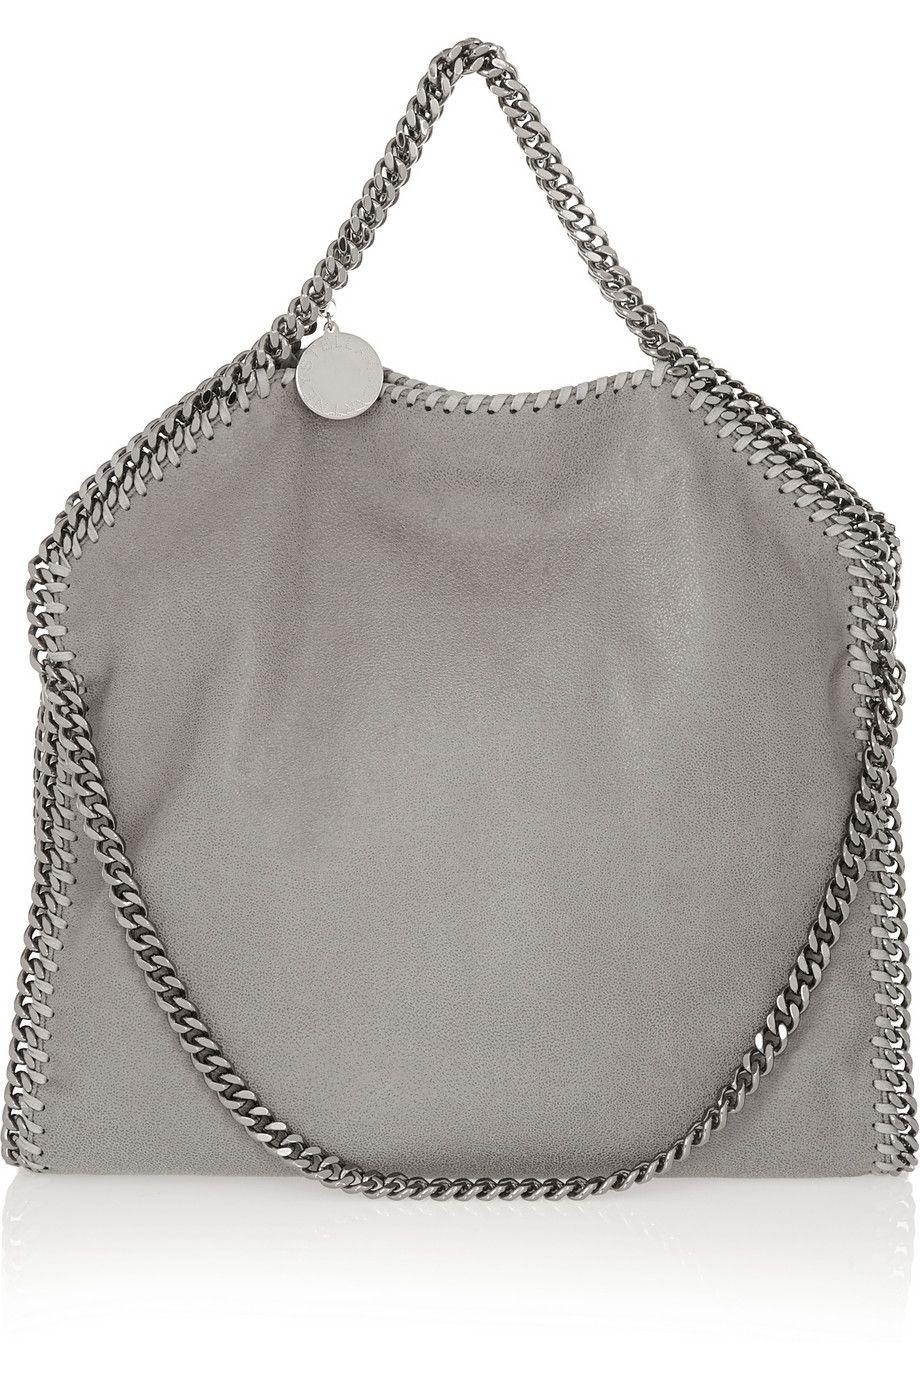 Stella McCartney Clutch Bag On Sale, Ruby, Leather, 2017, one size